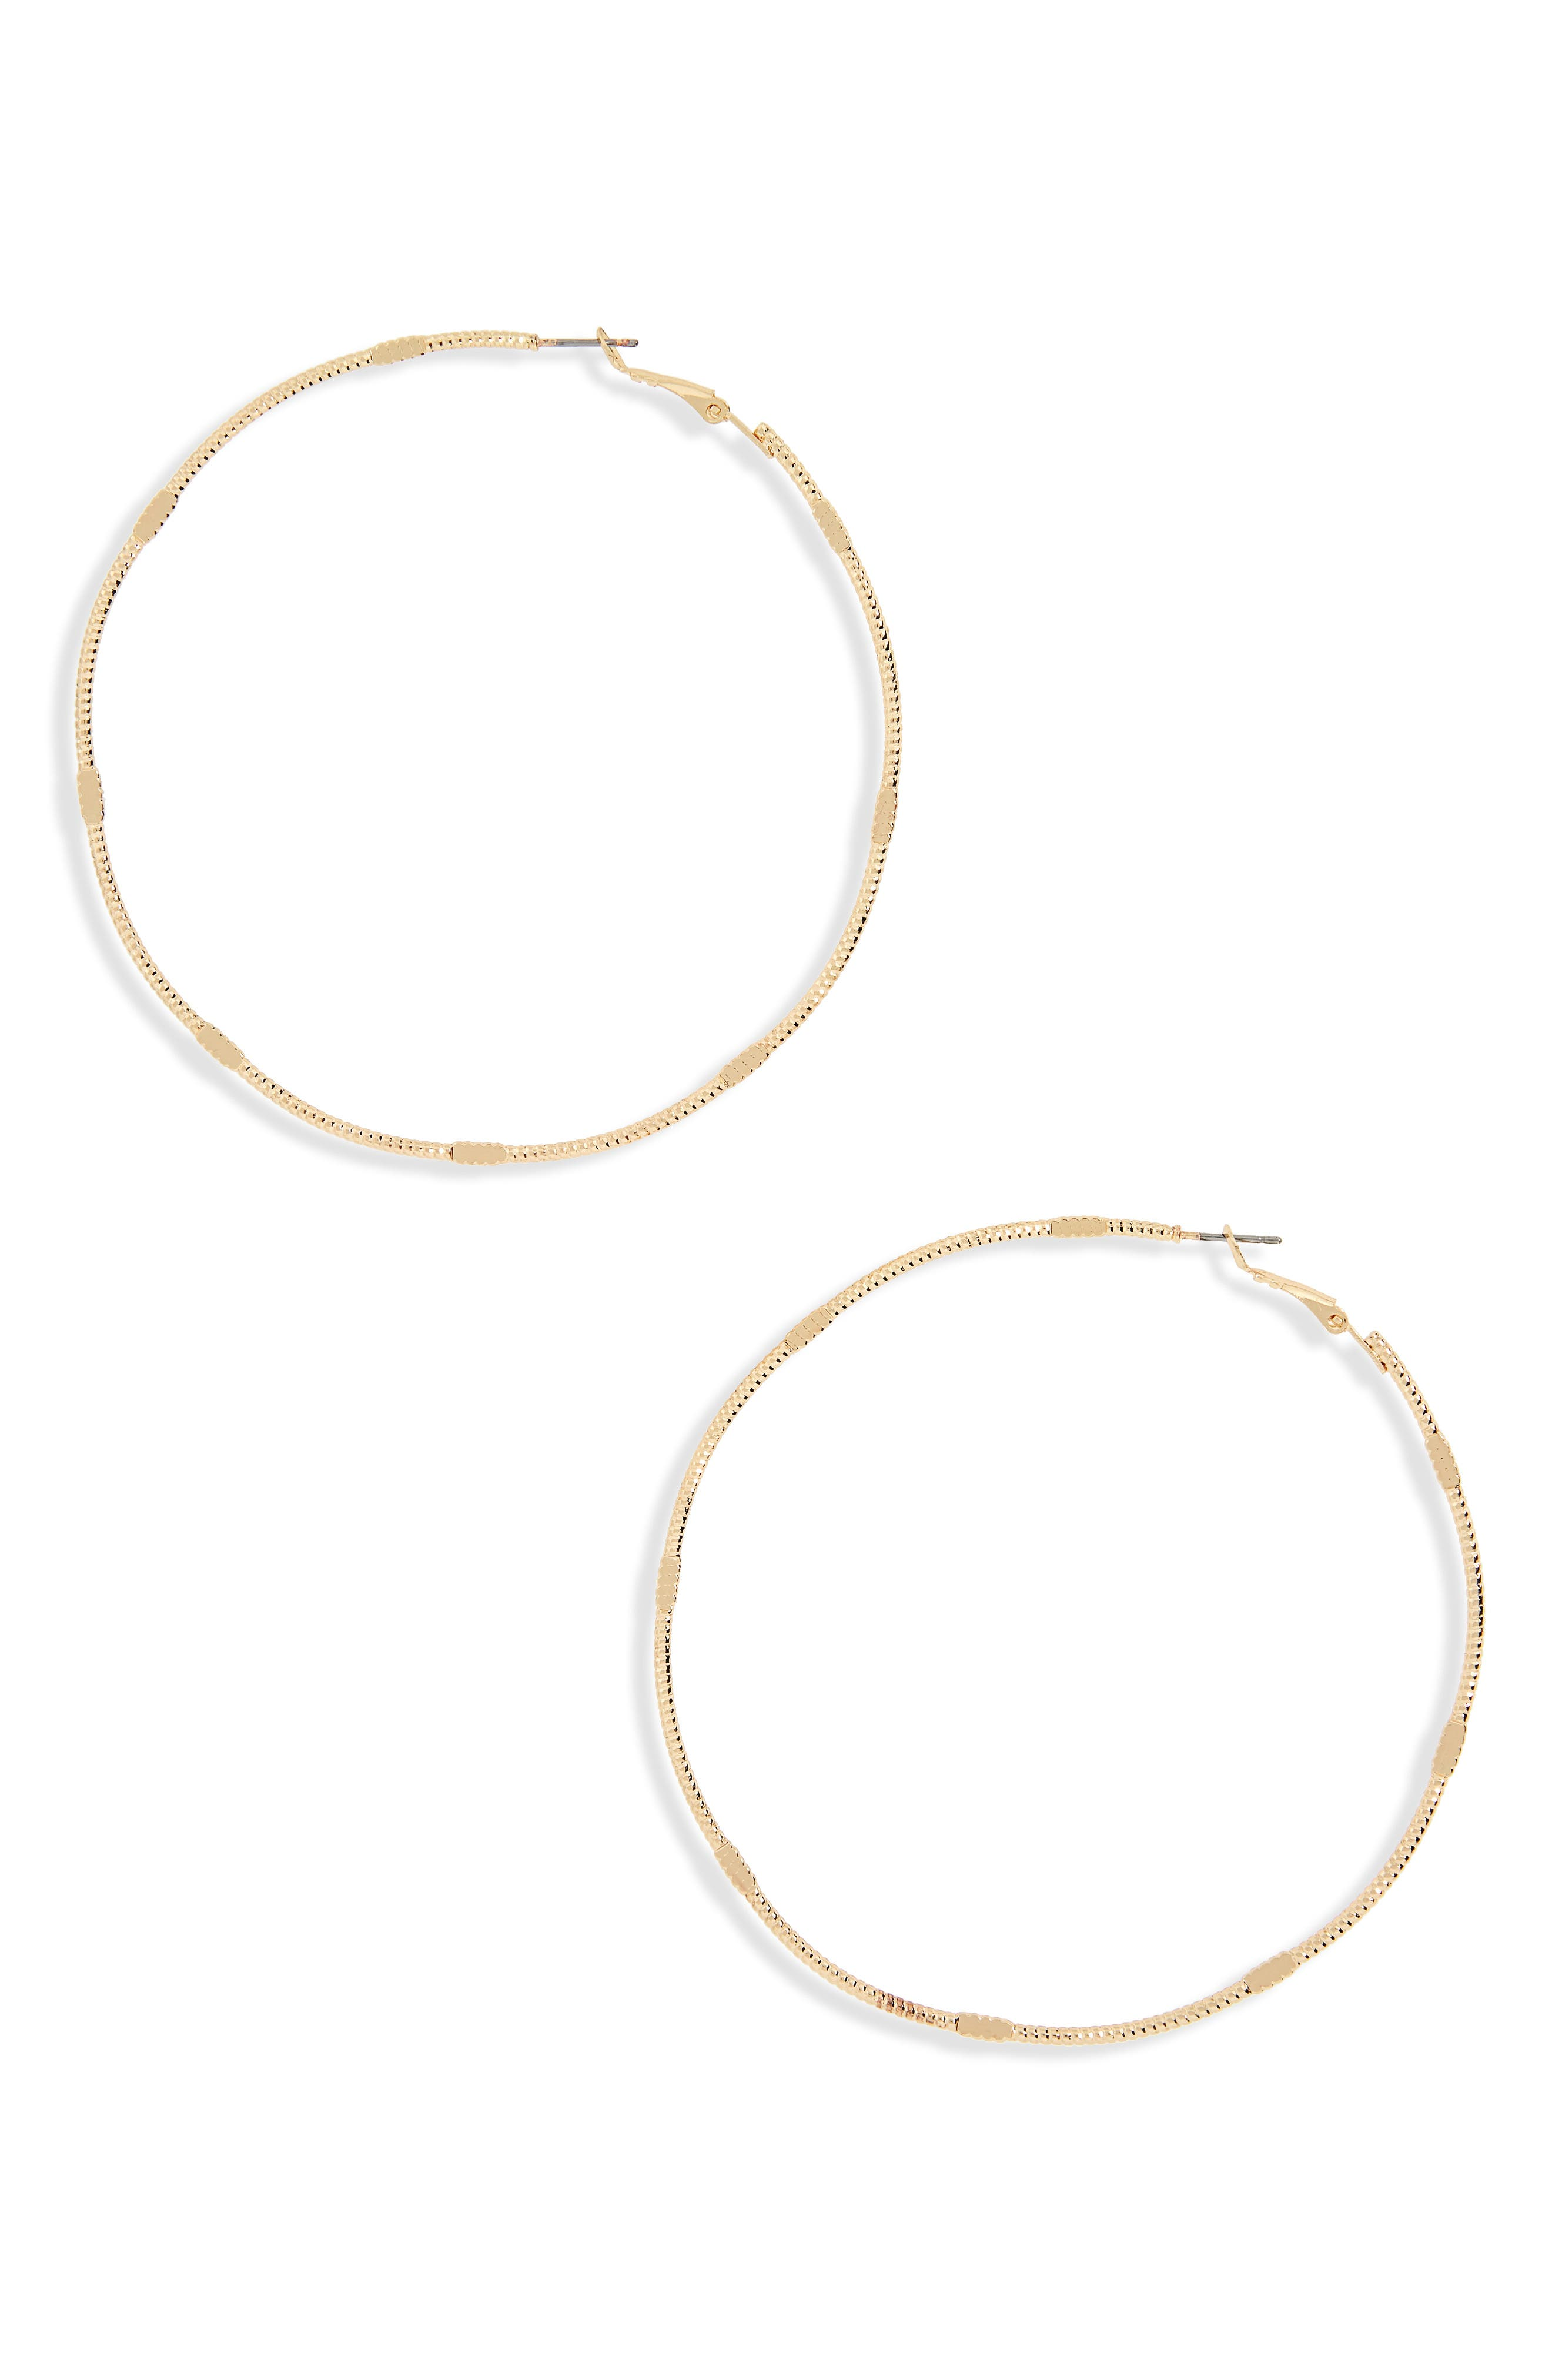 Flat Detail Oversize Hoop Earrings,                             Main thumbnail 1, color,                             710